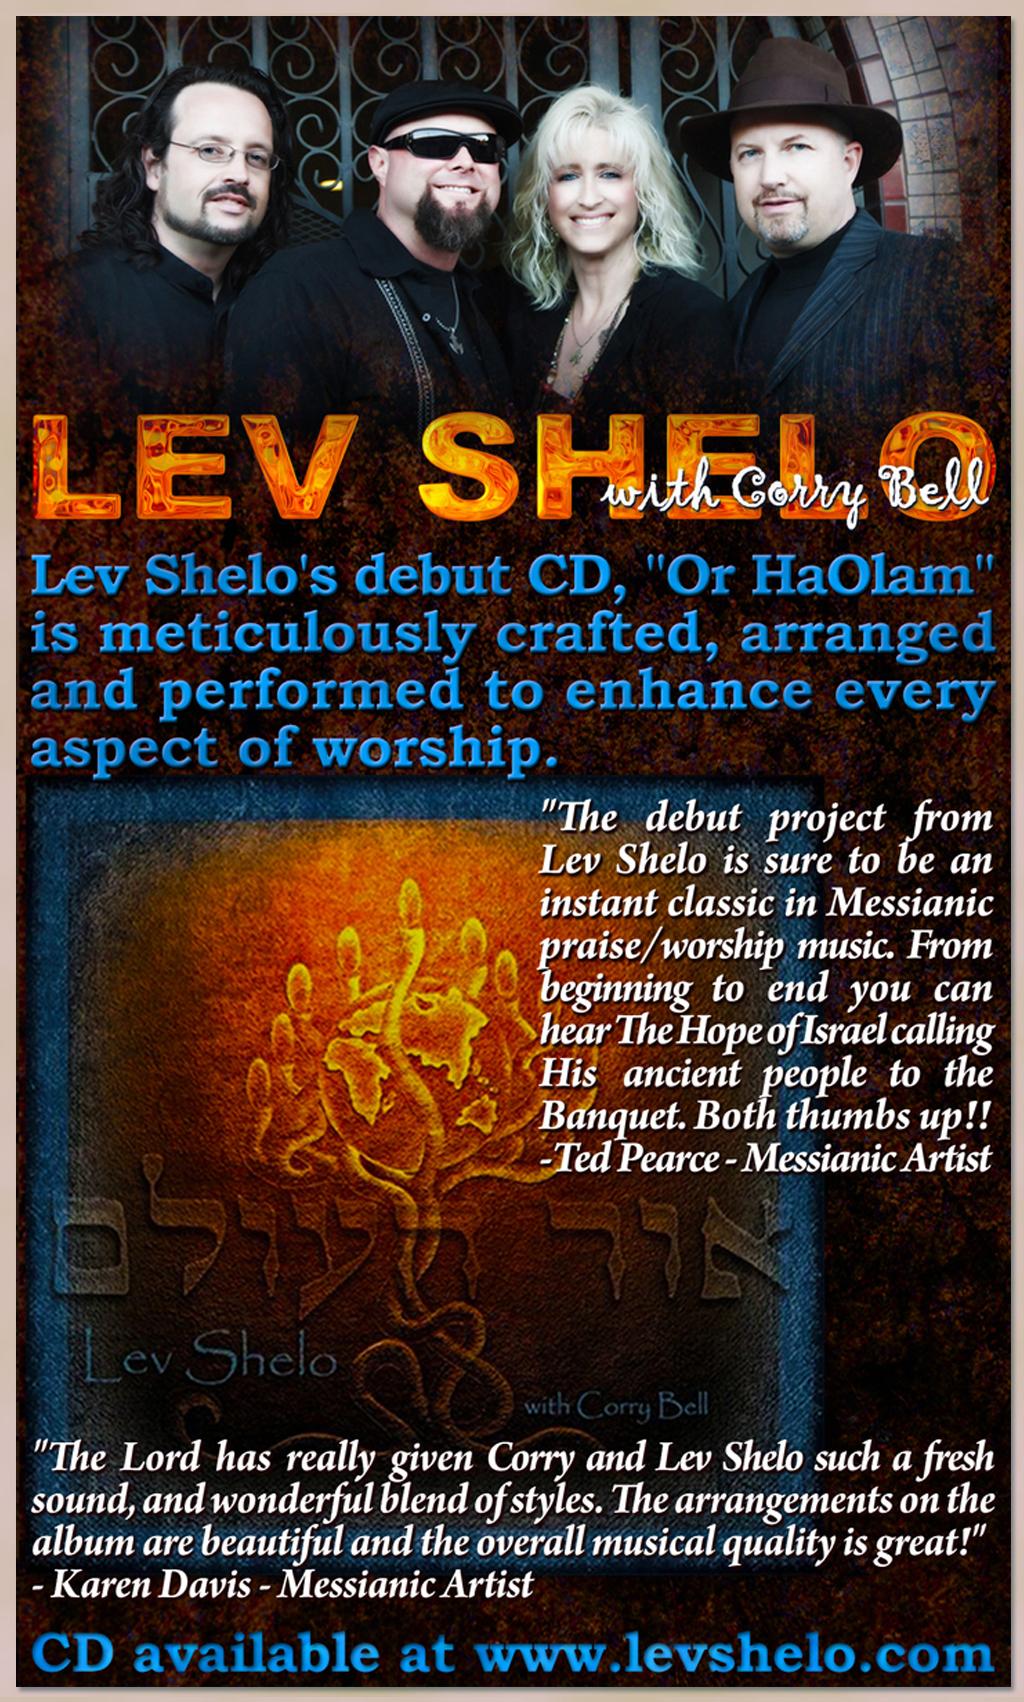 Lev Shelo